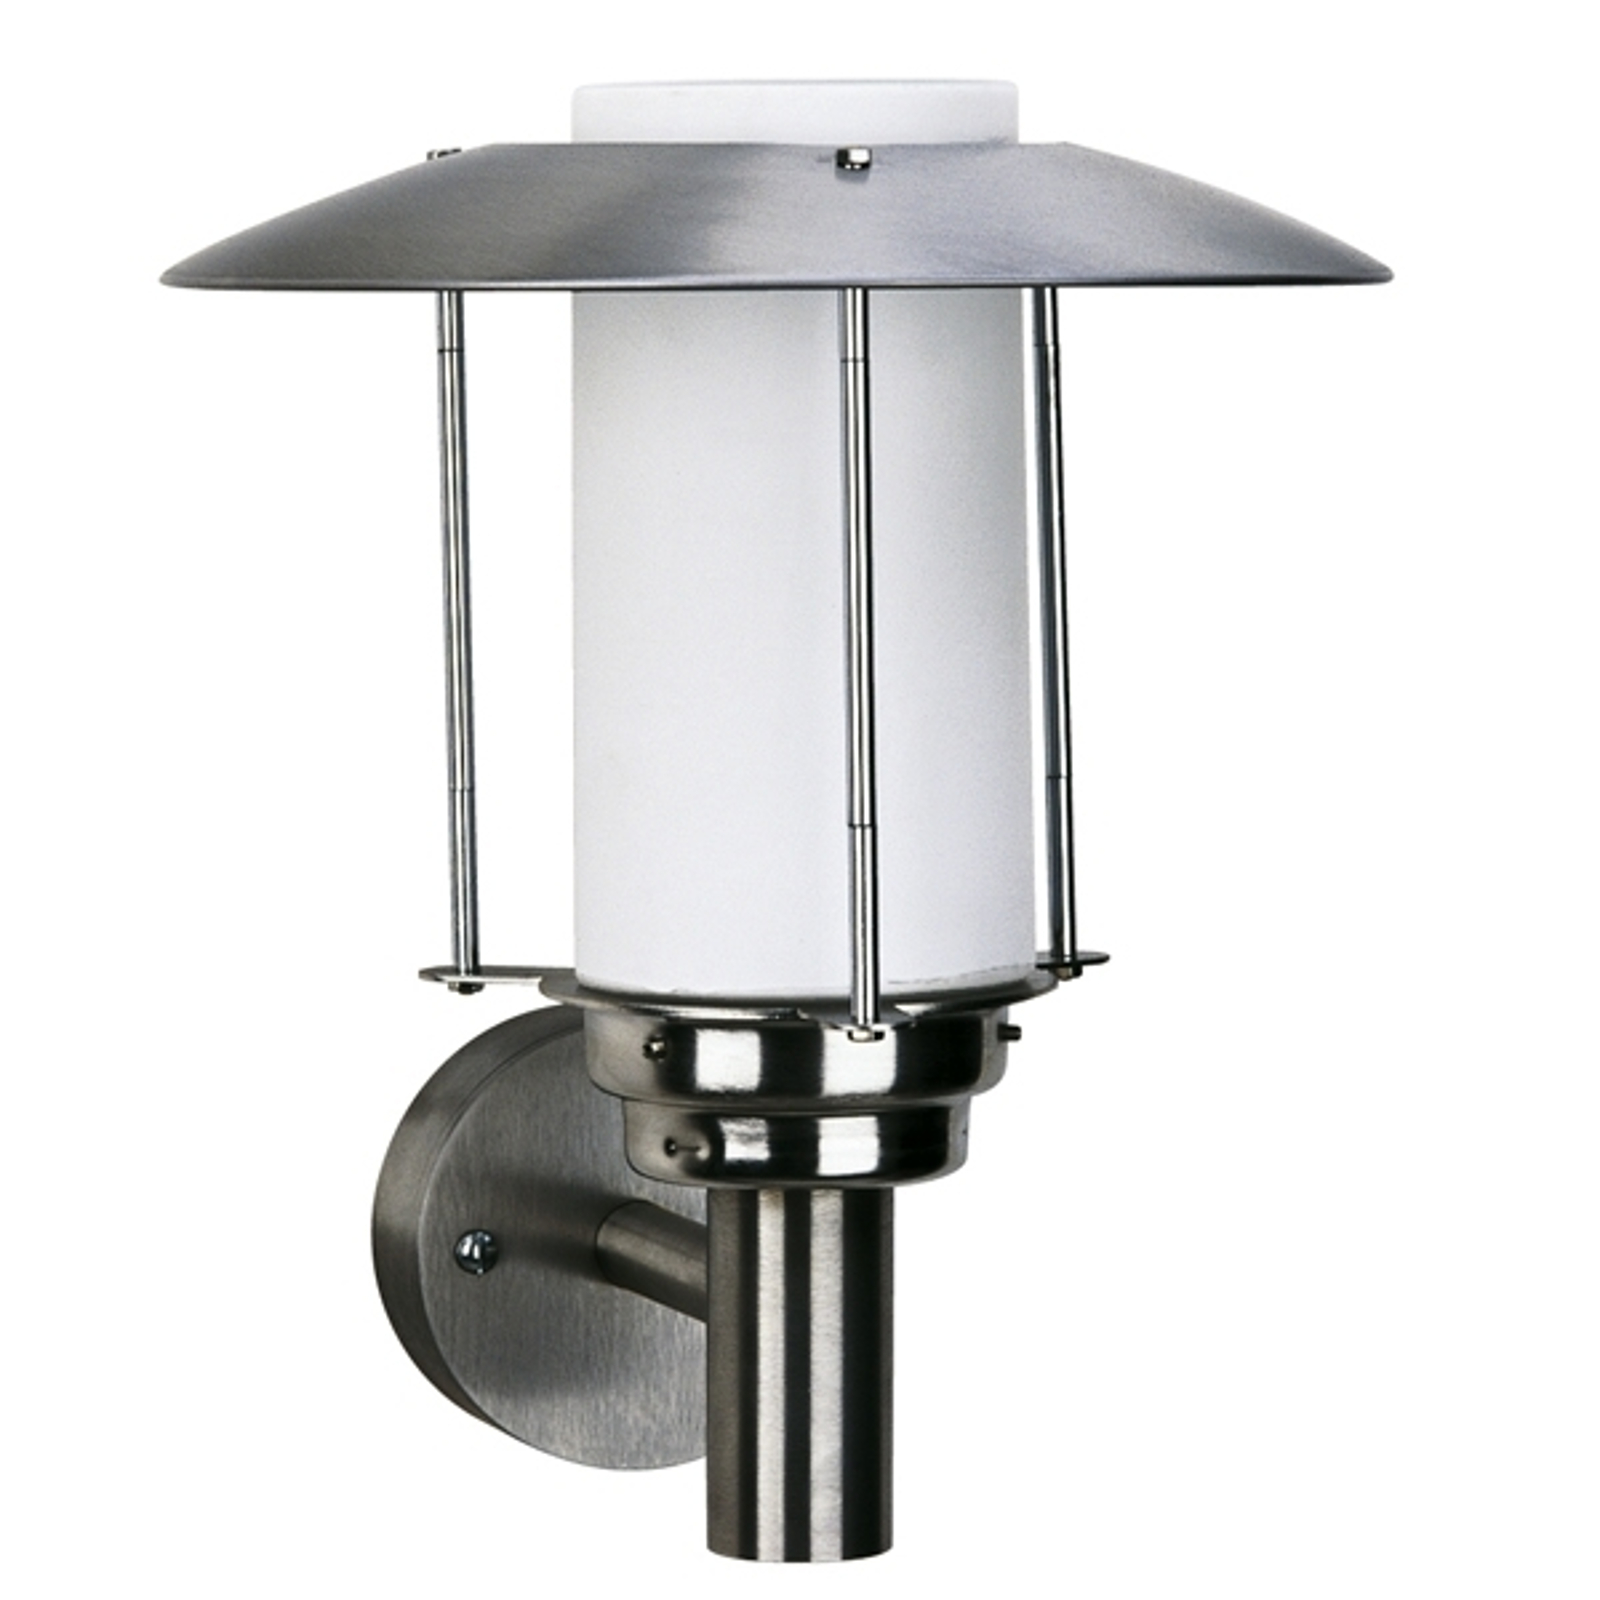 Buitenwandlamp 481 - made in Germany